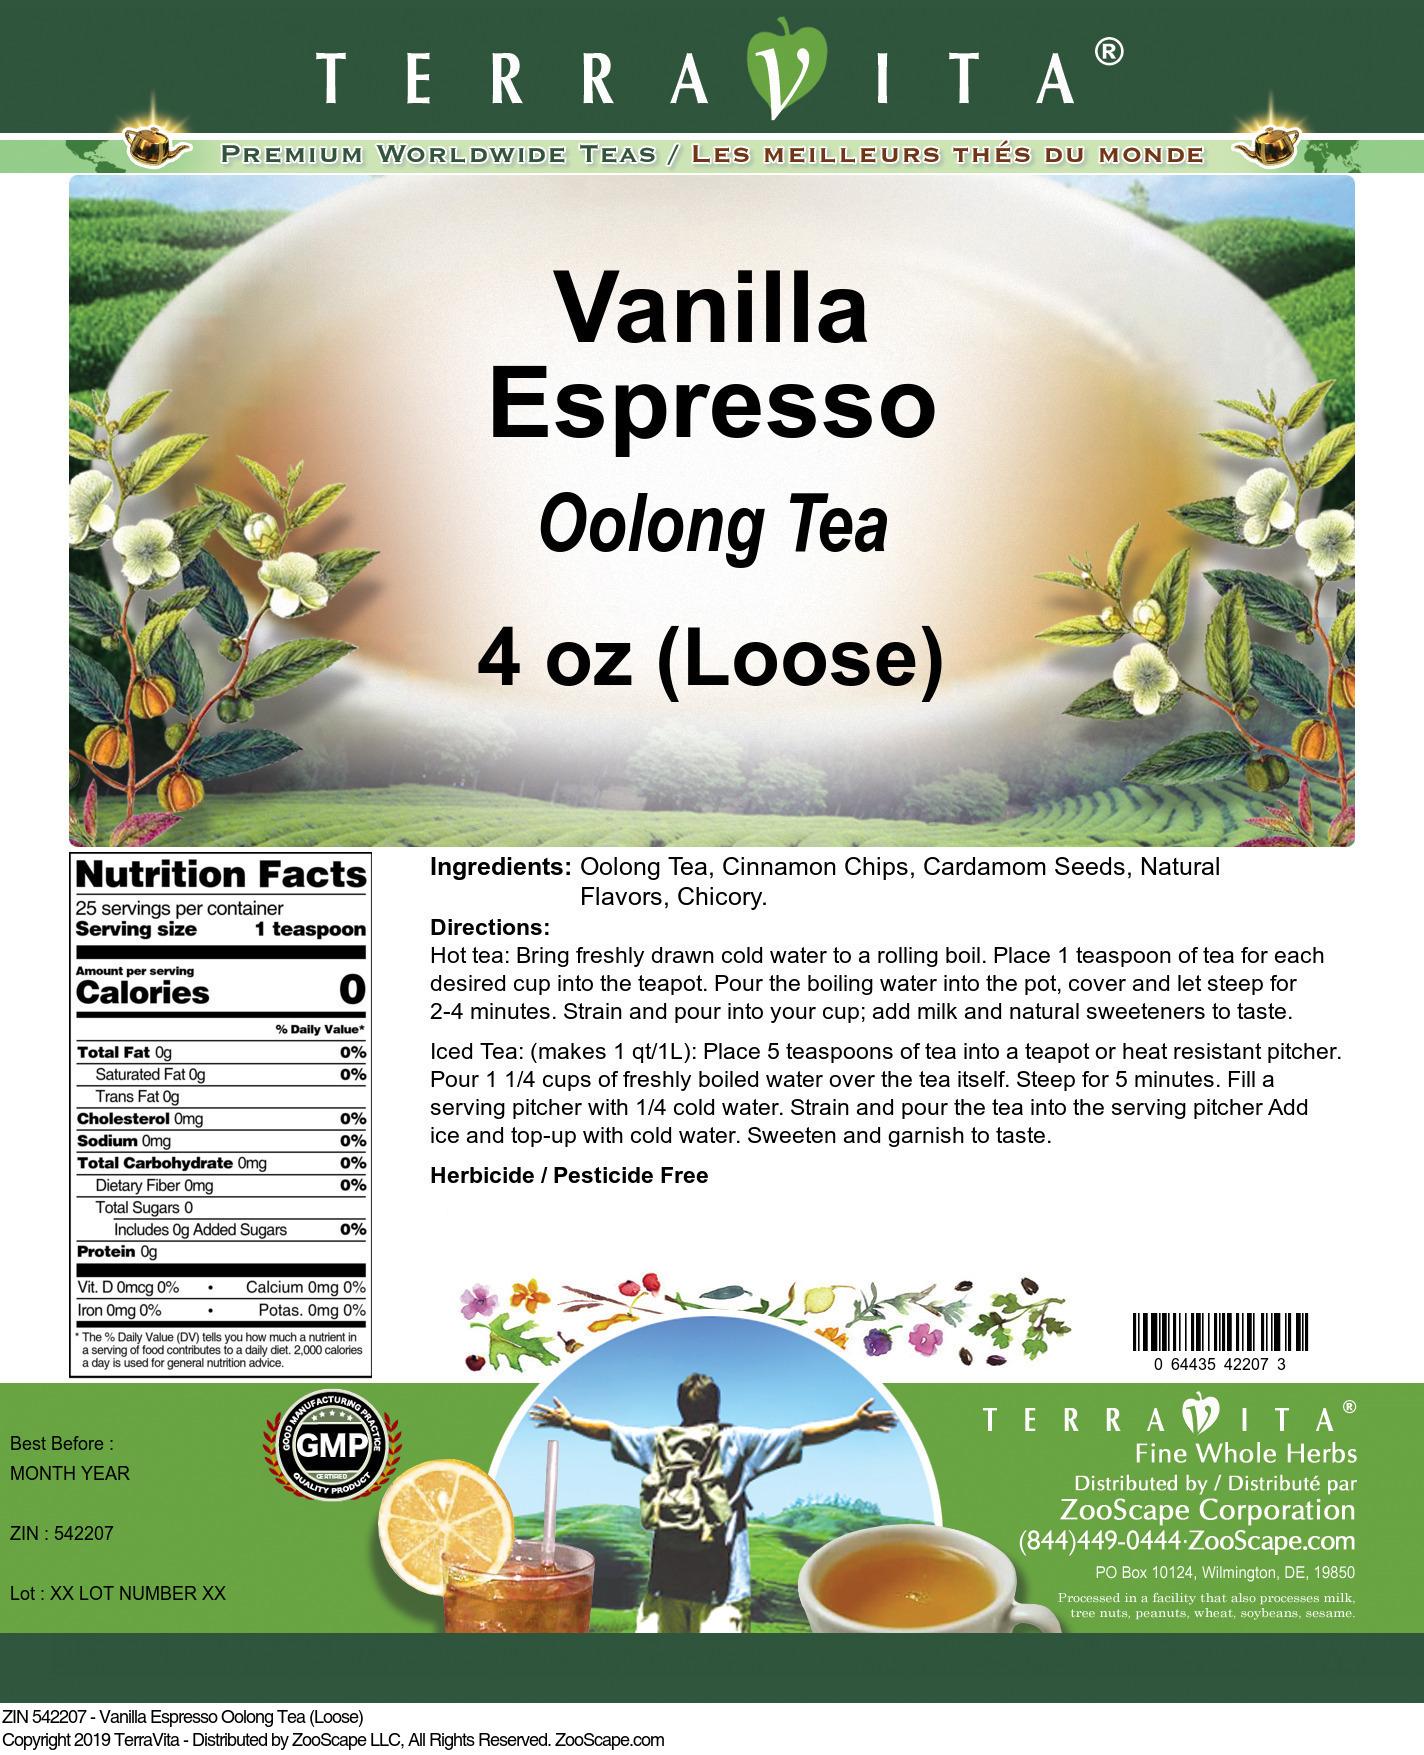 Vanilla Espresso Oolong Tea